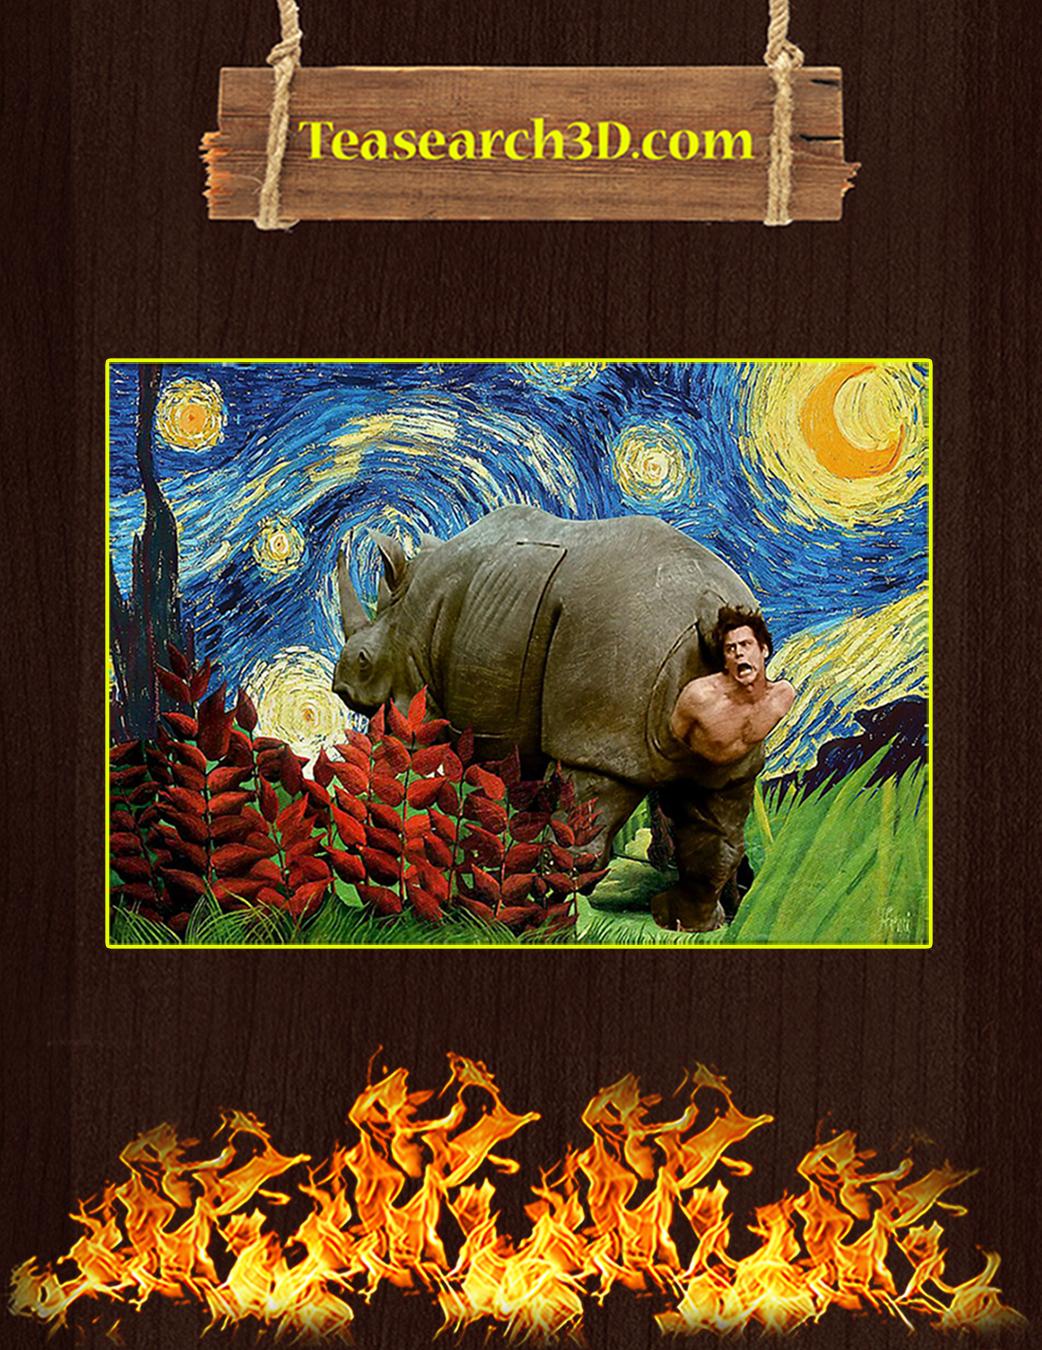 Rhino scene ace ventura starry night poster A1